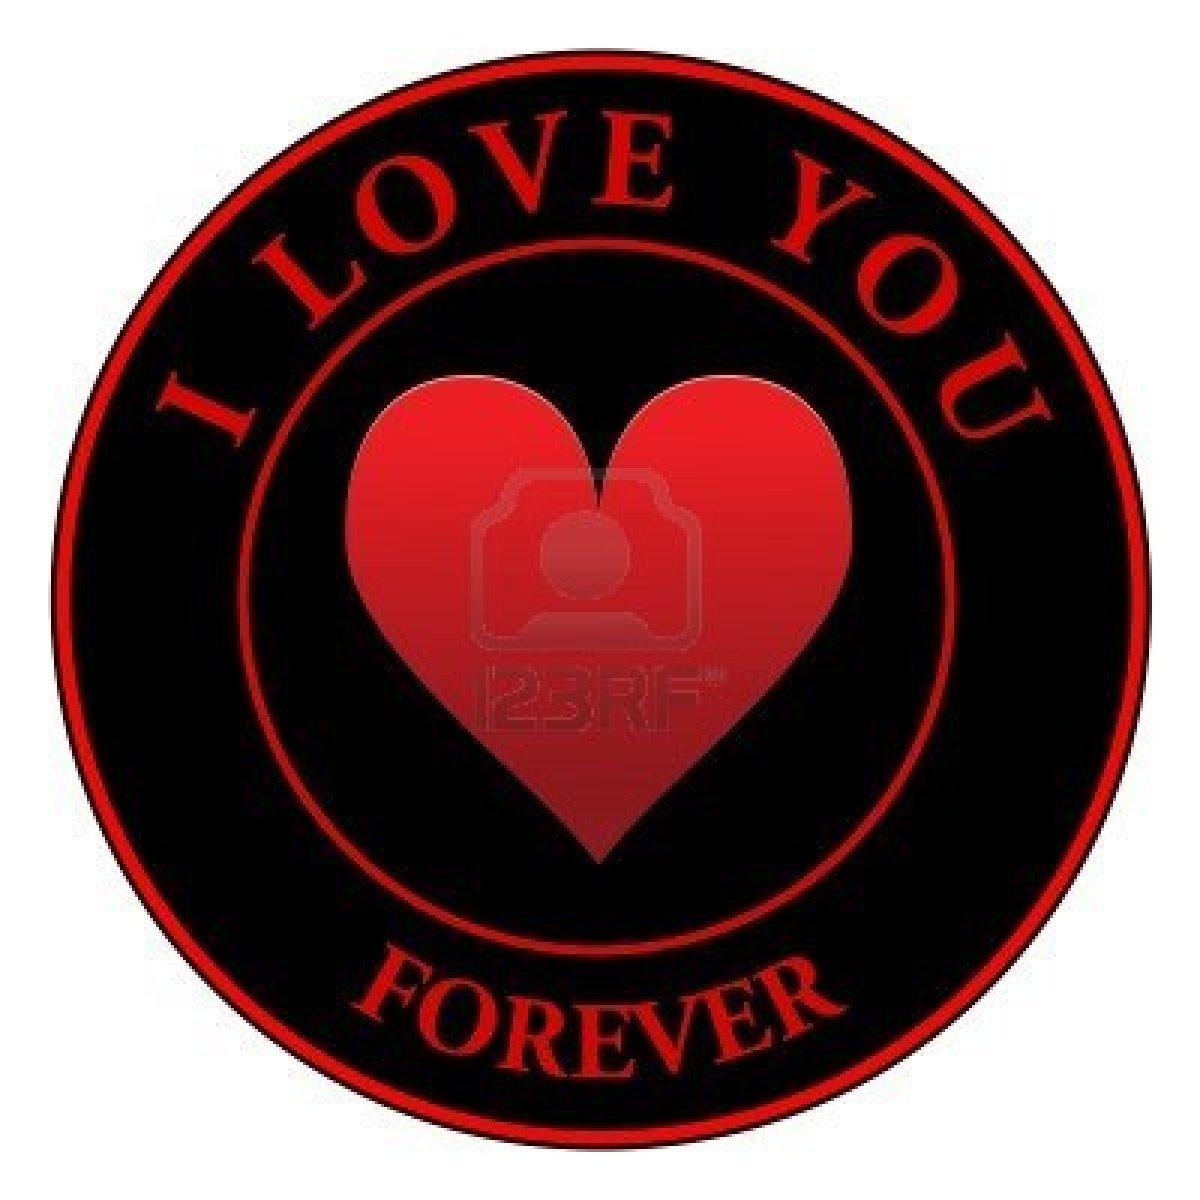 http://4.bp.blogspot.com/-UQwB14uf-eo/UB0tvHwyA9I/AAAAAAAAScg/oQth30c35aE/s1600/love+words+wallpaper+%25284%2529.jpg